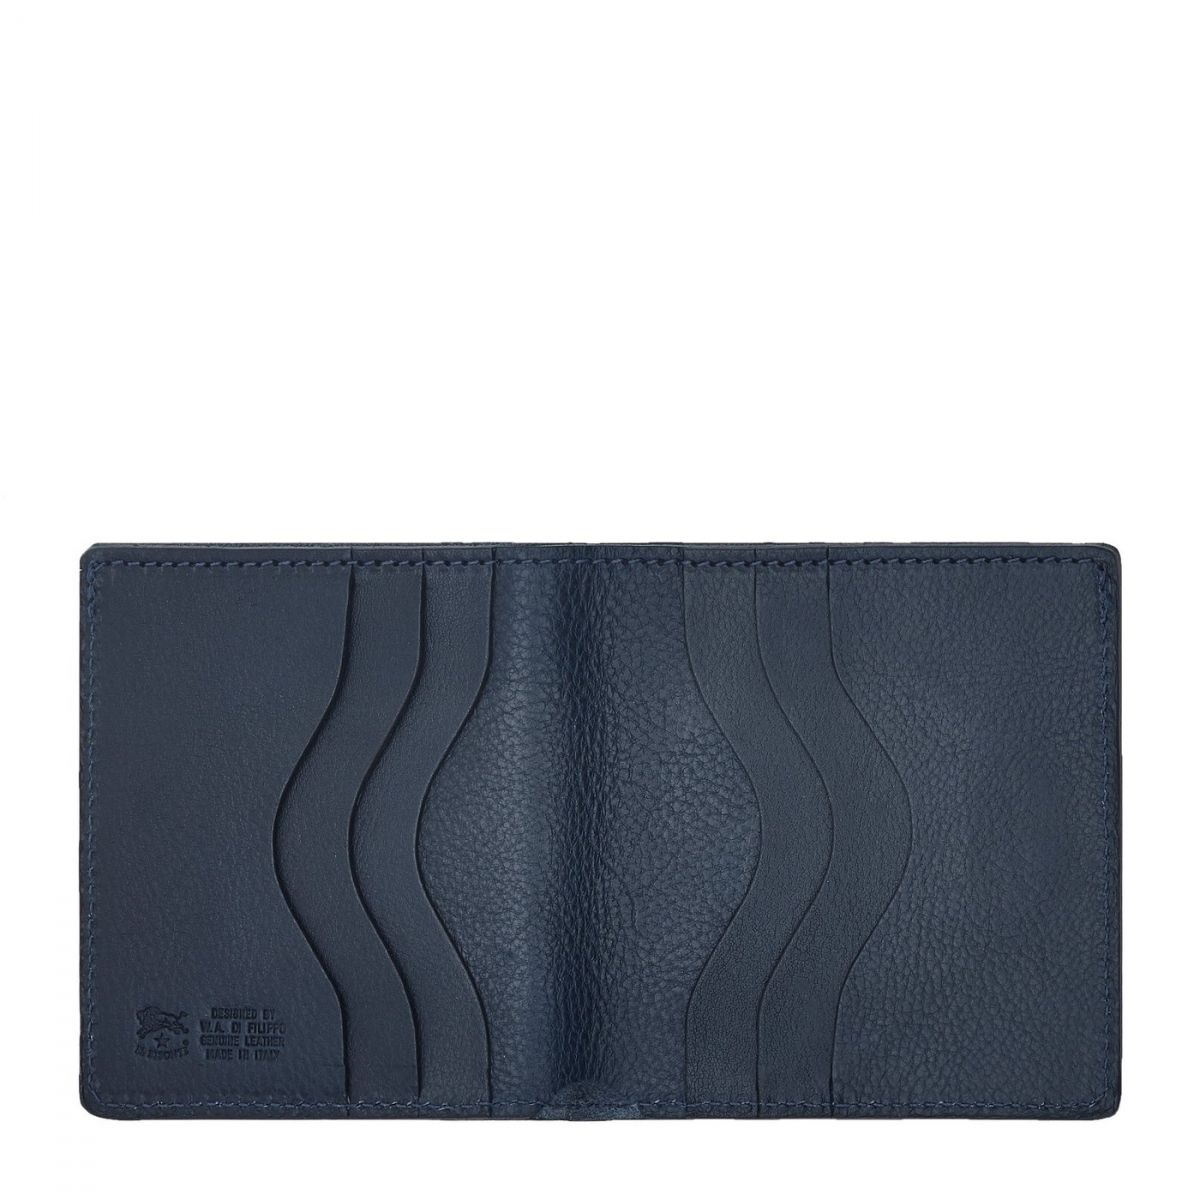 Men's Bi-Fold Wallet  in Cowhide Double Leather SBW004 color Blue | Details